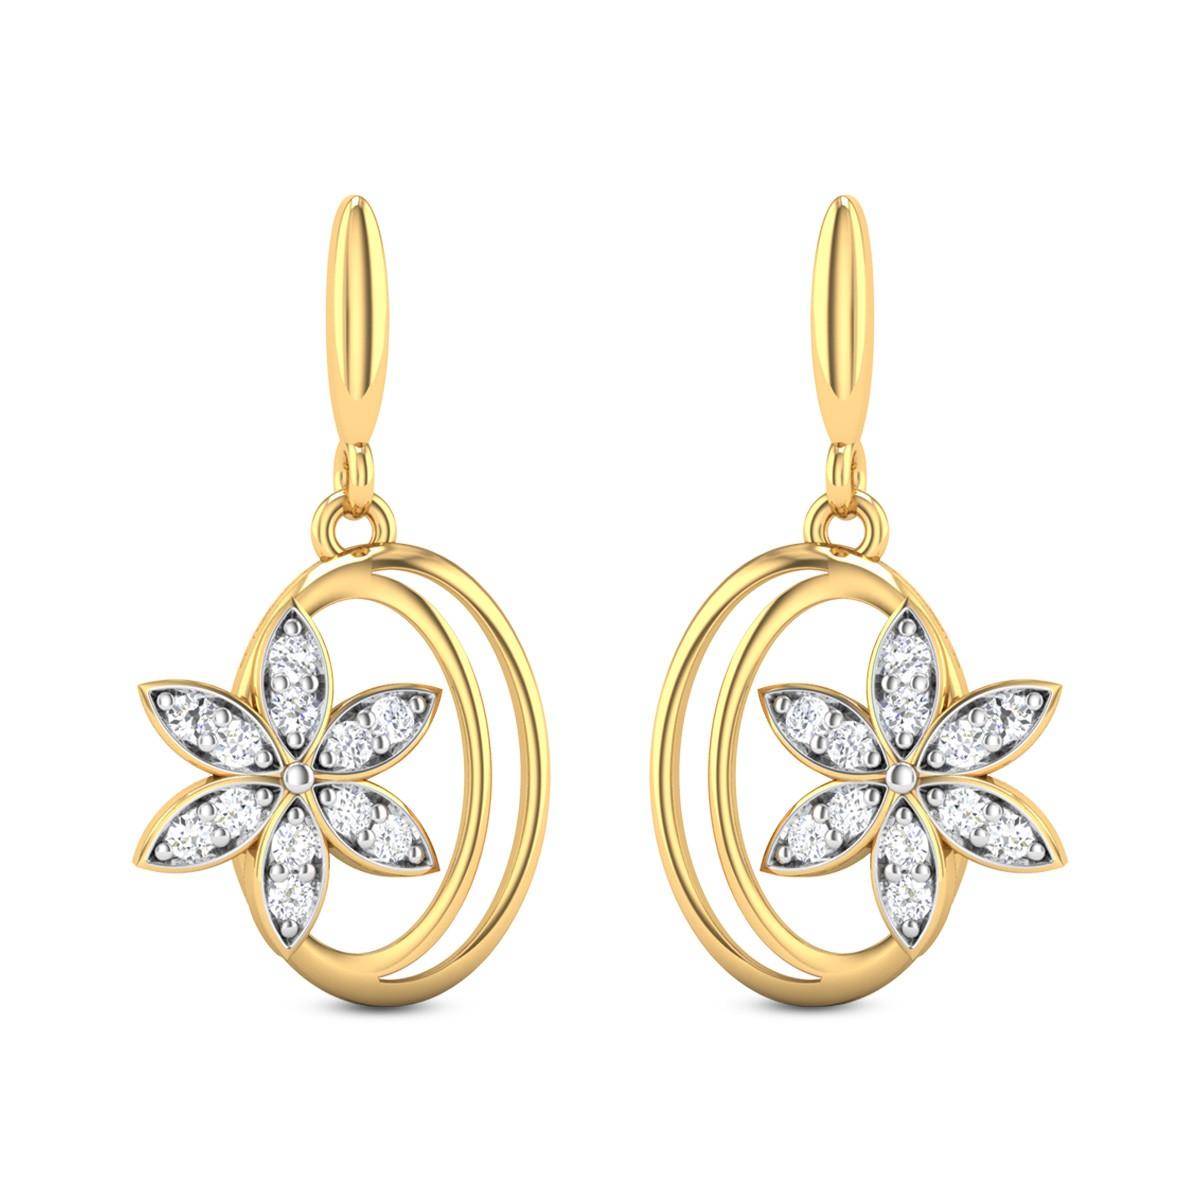 Bailey Diamond Earrings